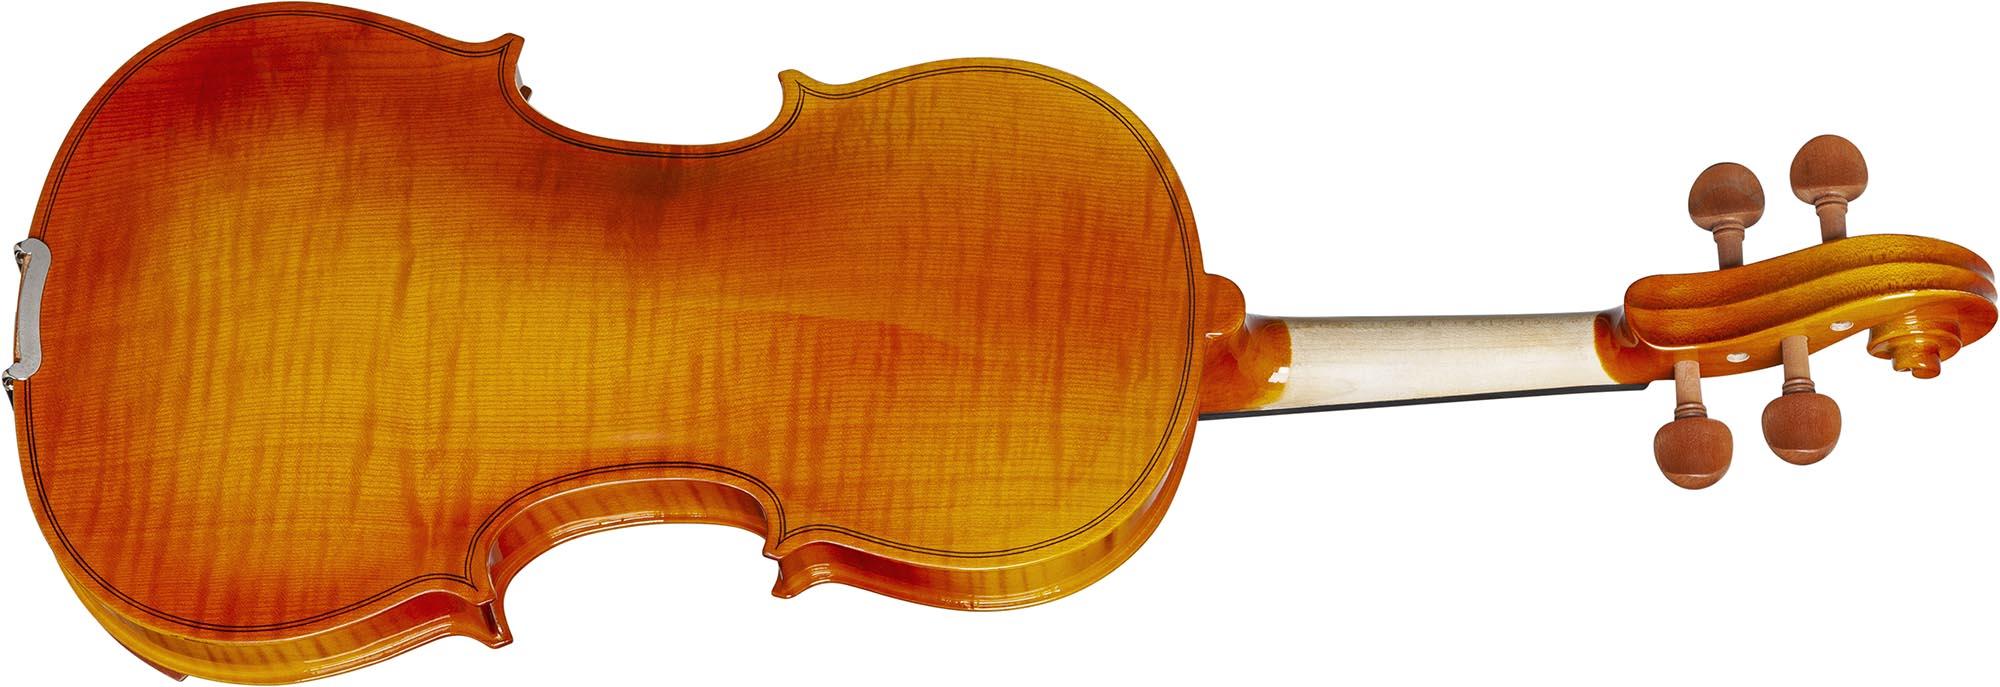 hve242 violino hofma visao posterior